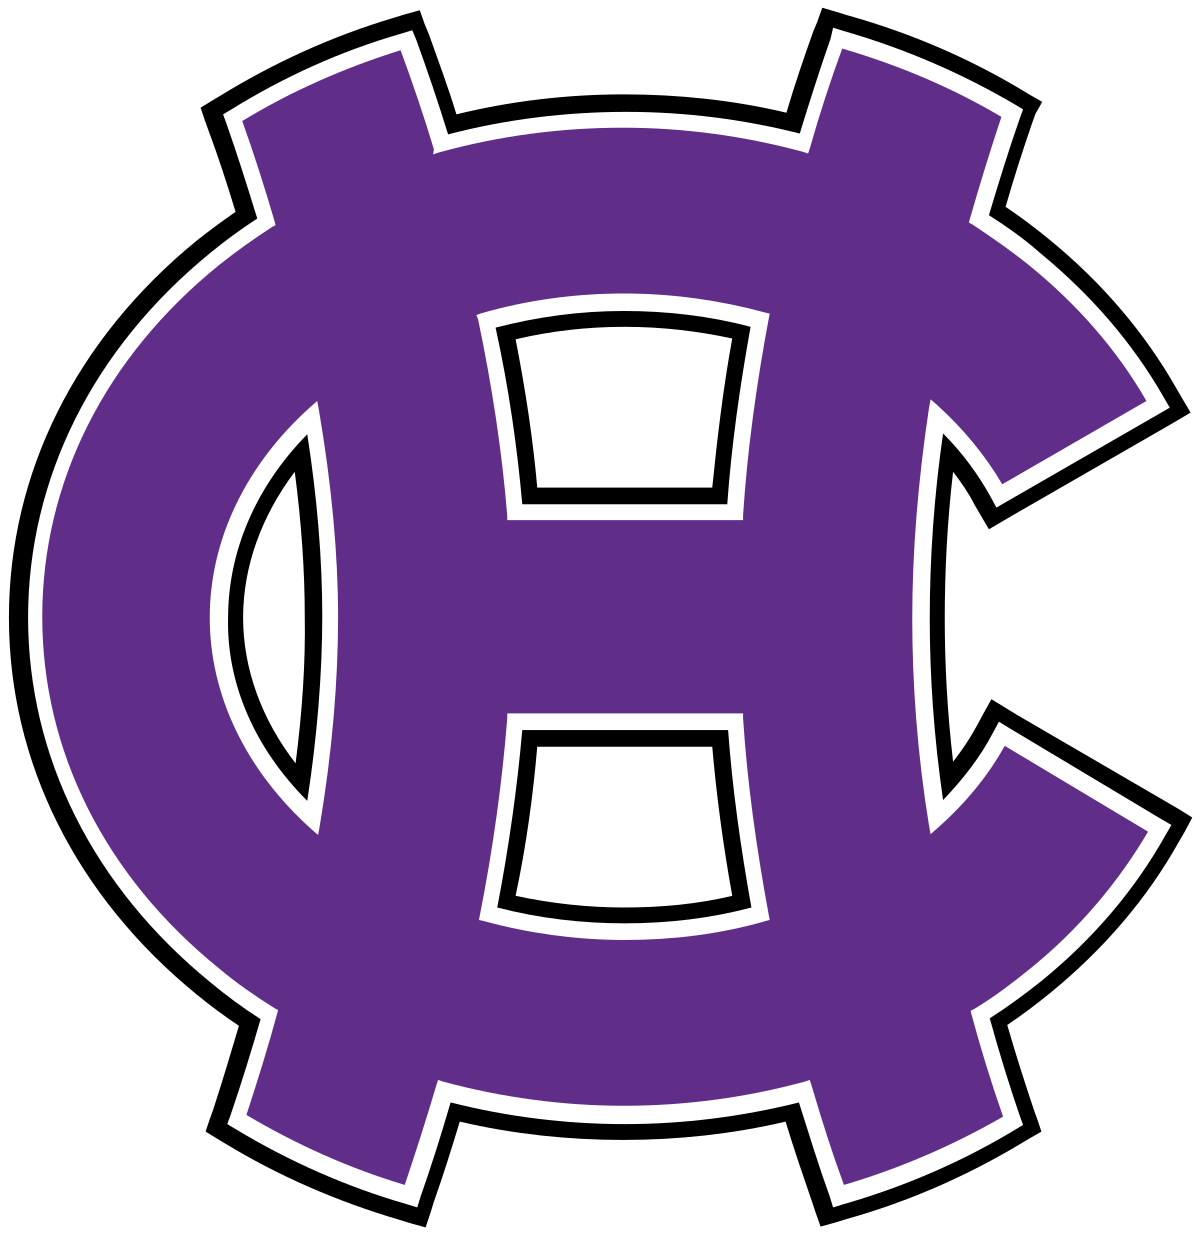 Clipart football team vector royalty free Holy Cross Clipart | Free download best Holy Cross Clipart on ... vector royalty free